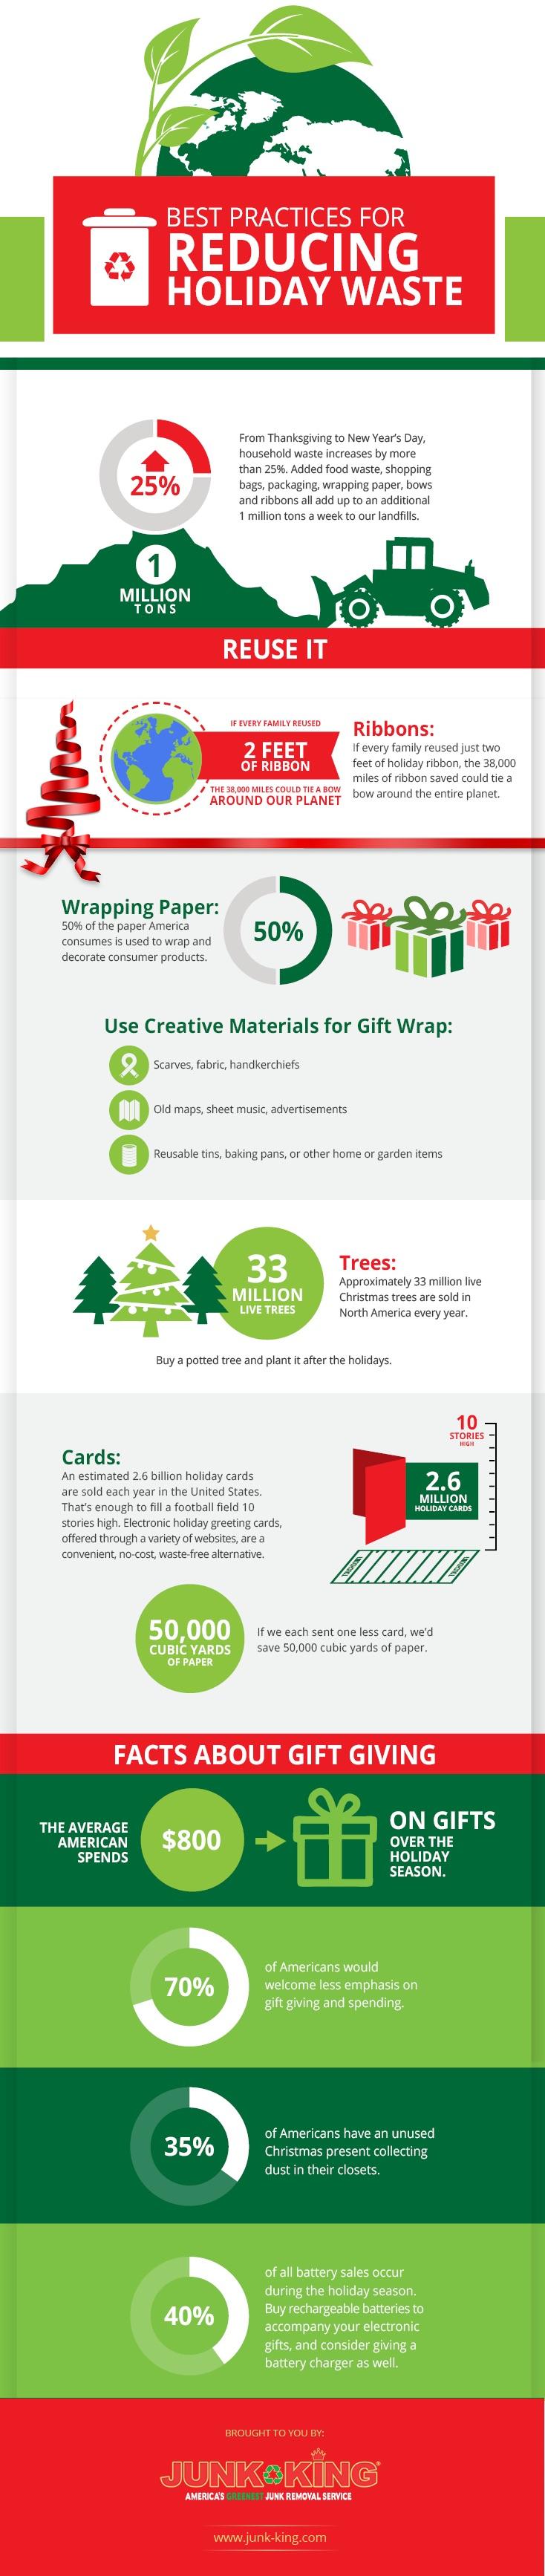 reduce holiday waste